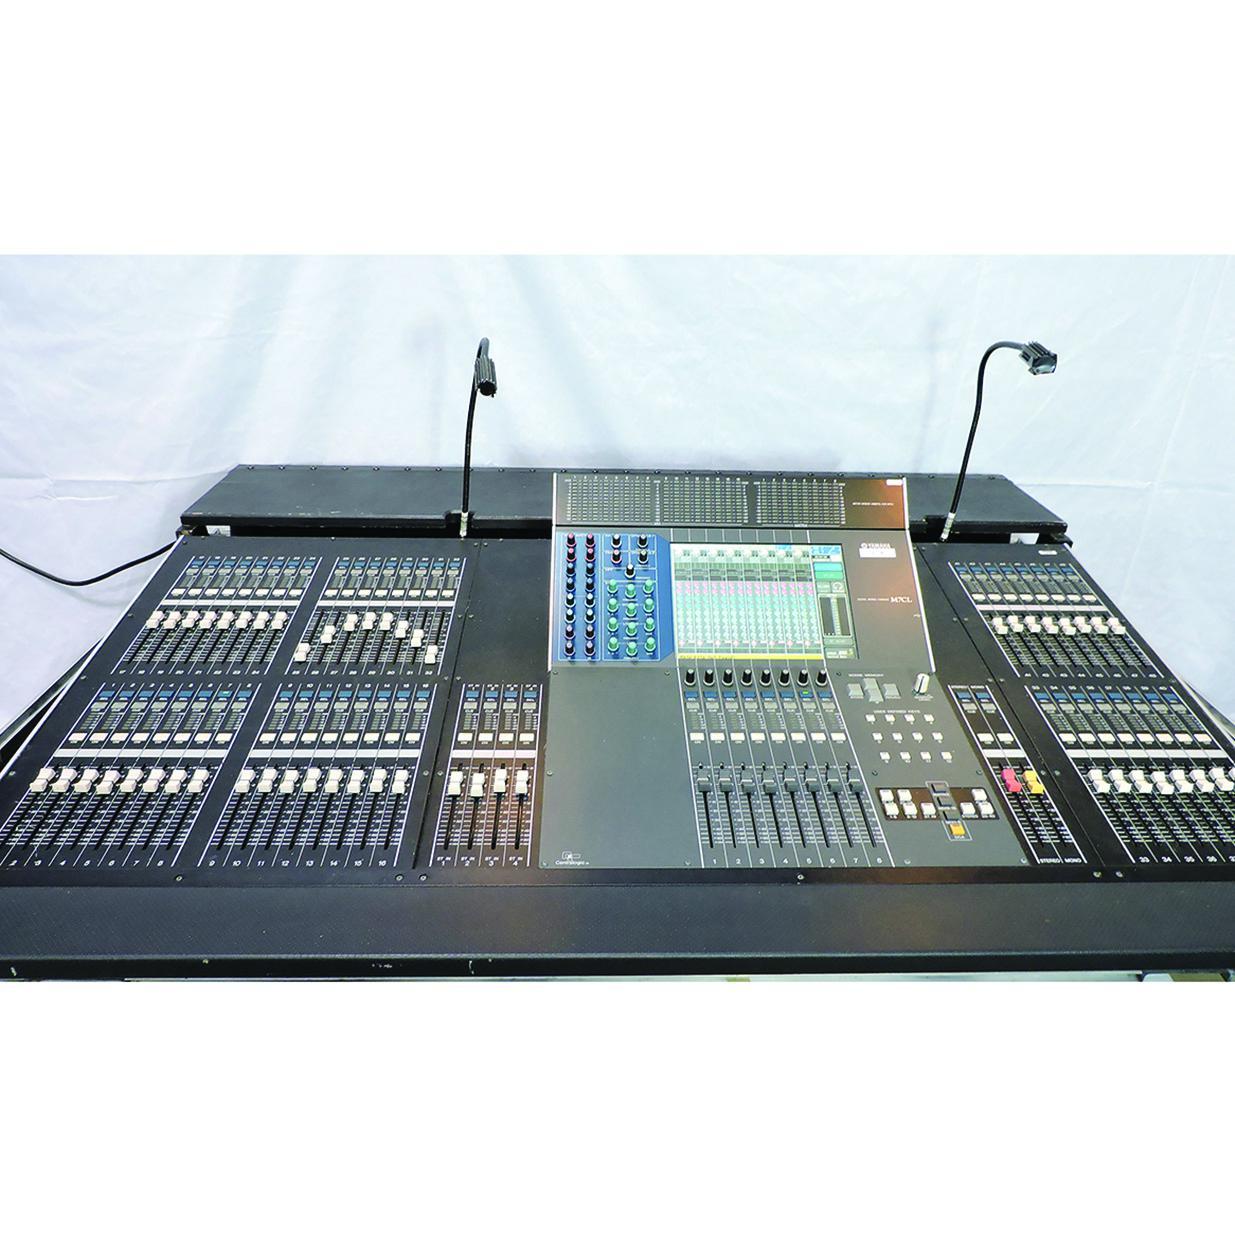 Prg proshop yamaha m7cl48 audio digital console for Yamaha sound console